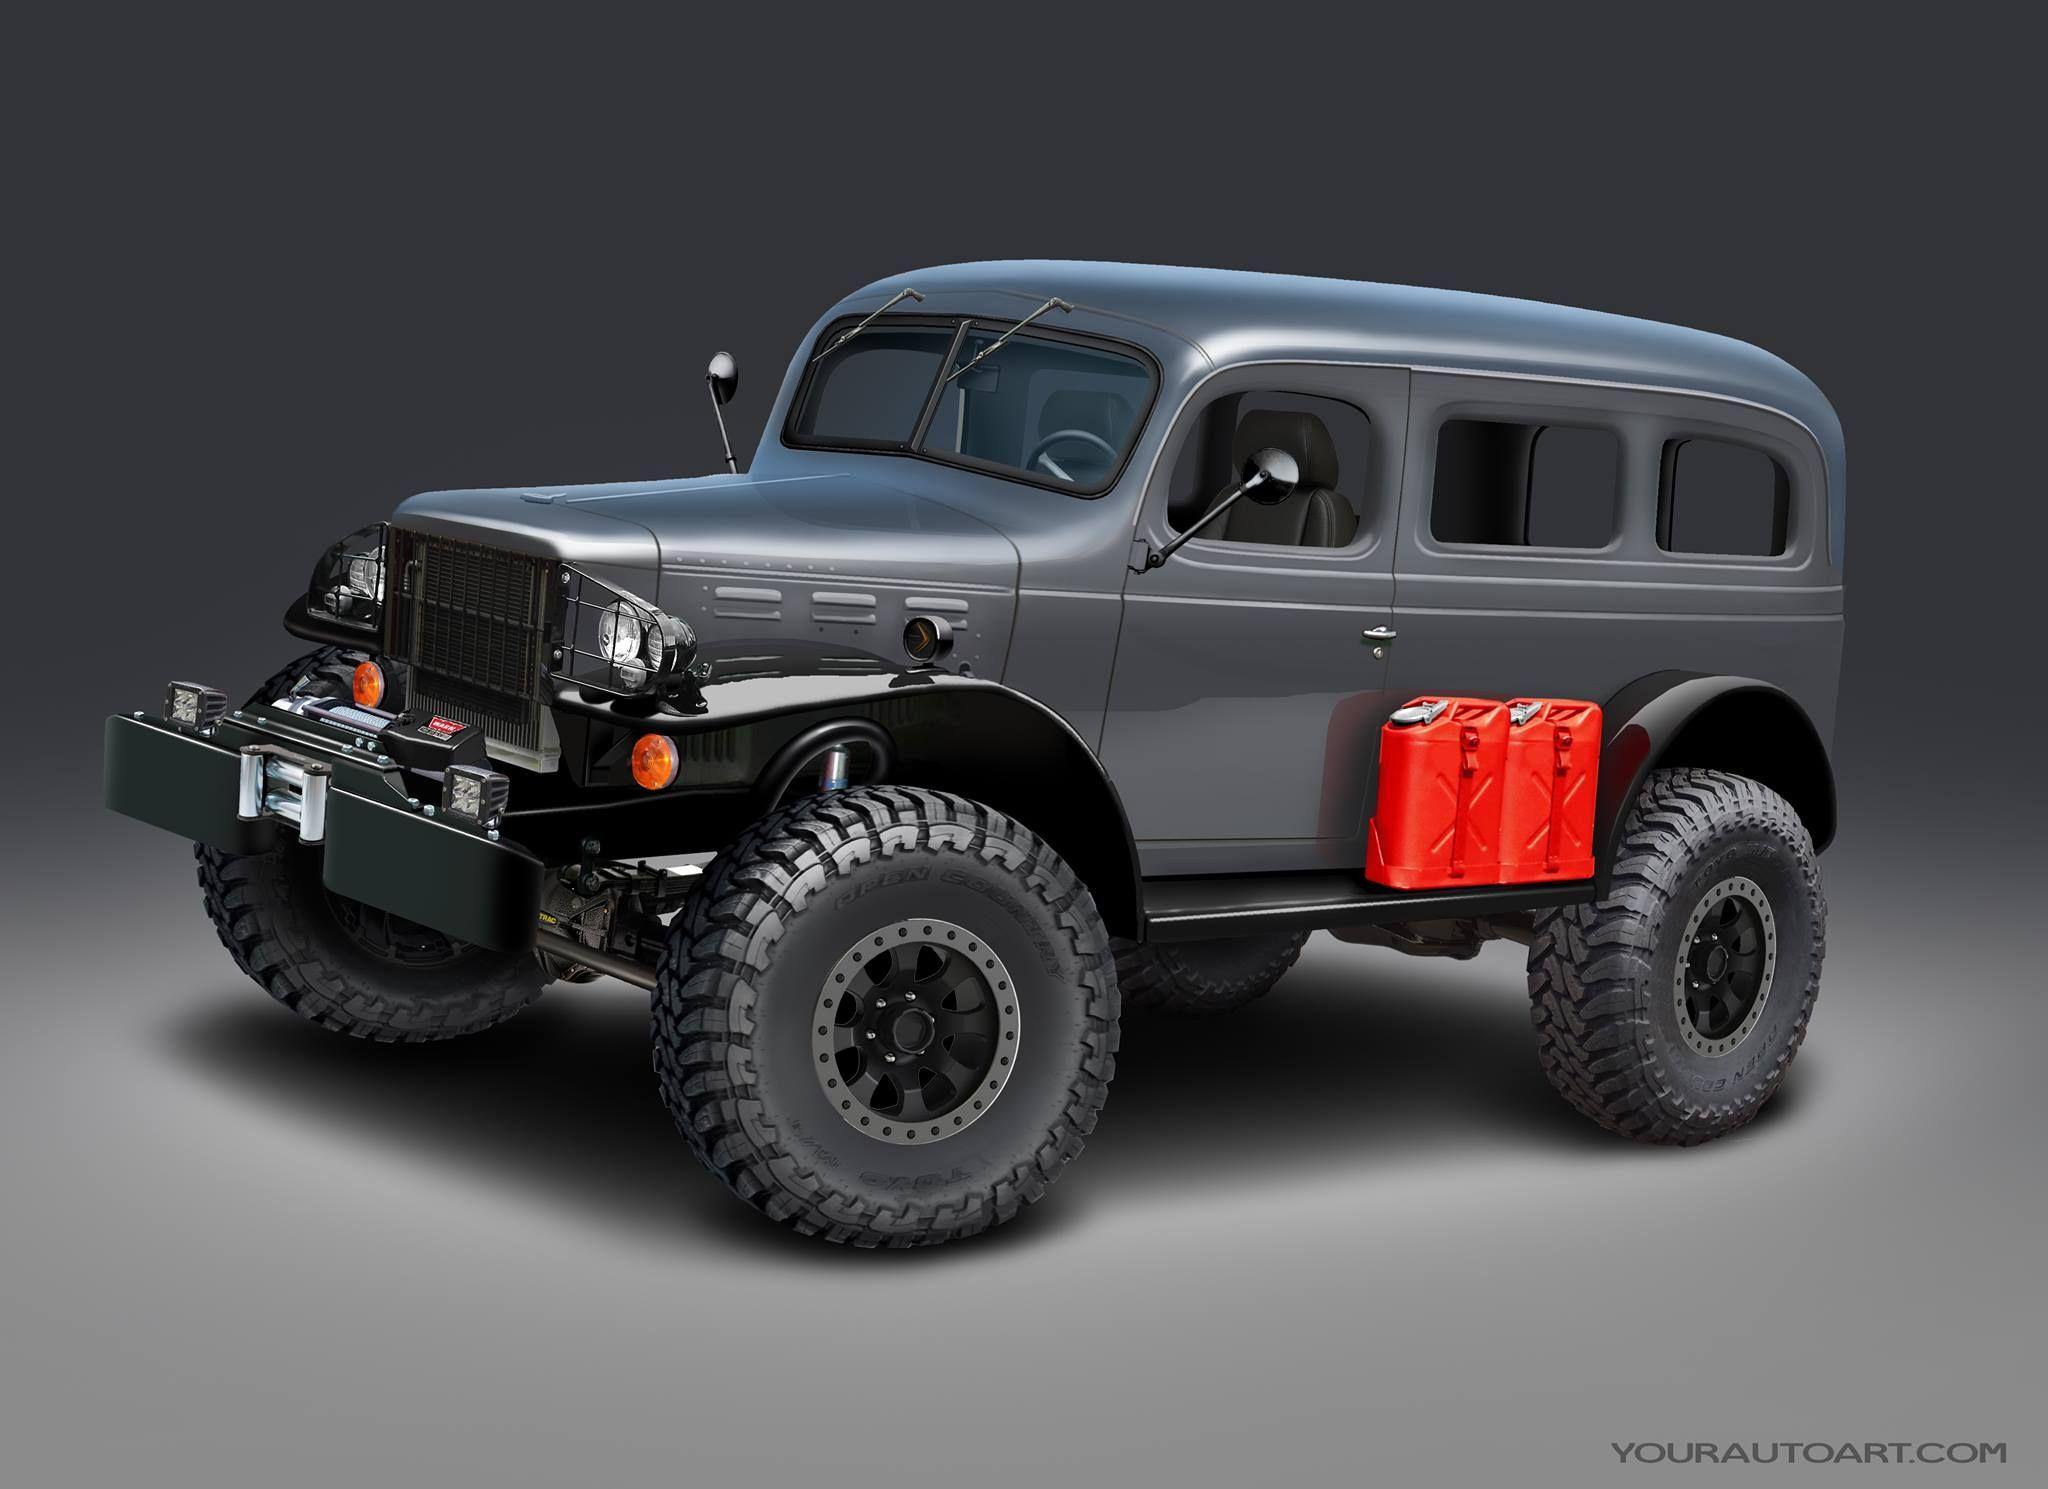 1943 dodge carryall 392 hemi 5 speed auto atlas dynatrac prorock 60 on 37 toyo r t tires. Black Bedroom Furniture Sets. Home Design Ideas